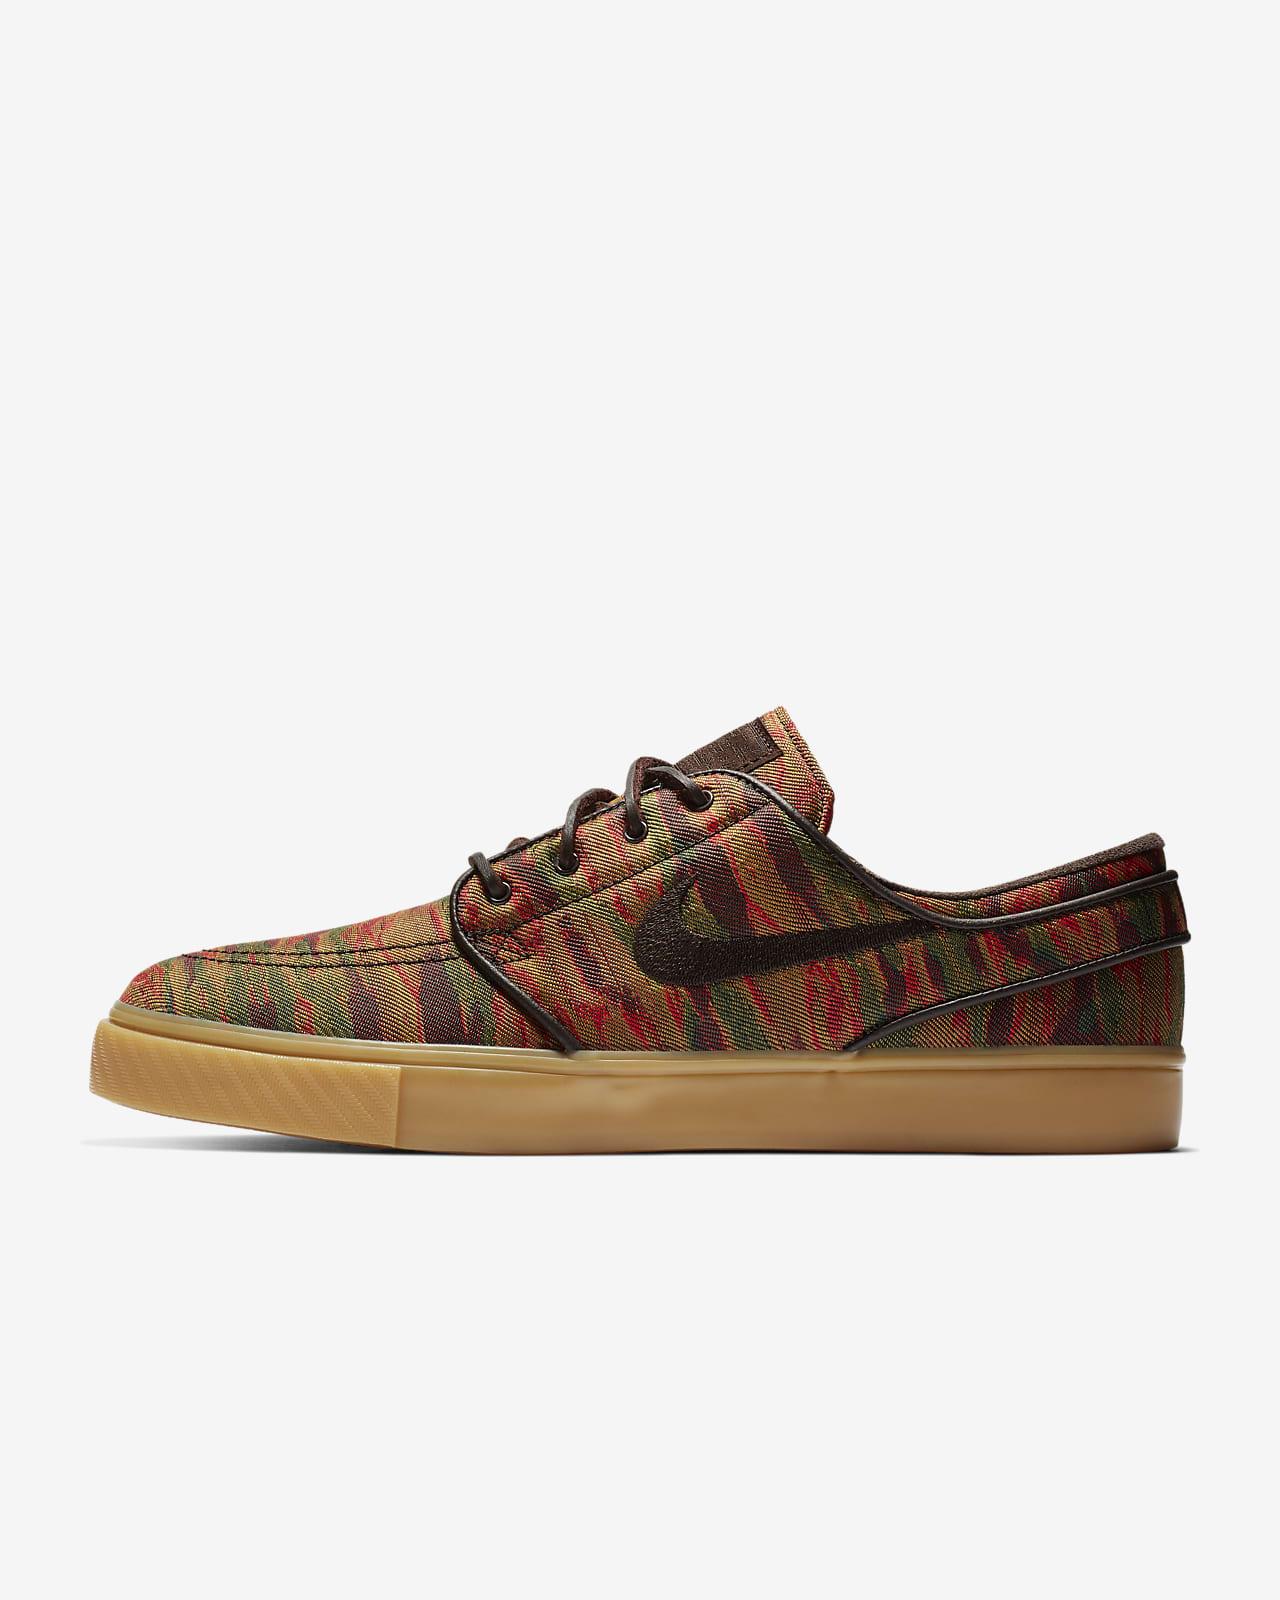 Nike SB Zoom Stefan Janoski Canvas Premium Men's Skateboarding Shoe